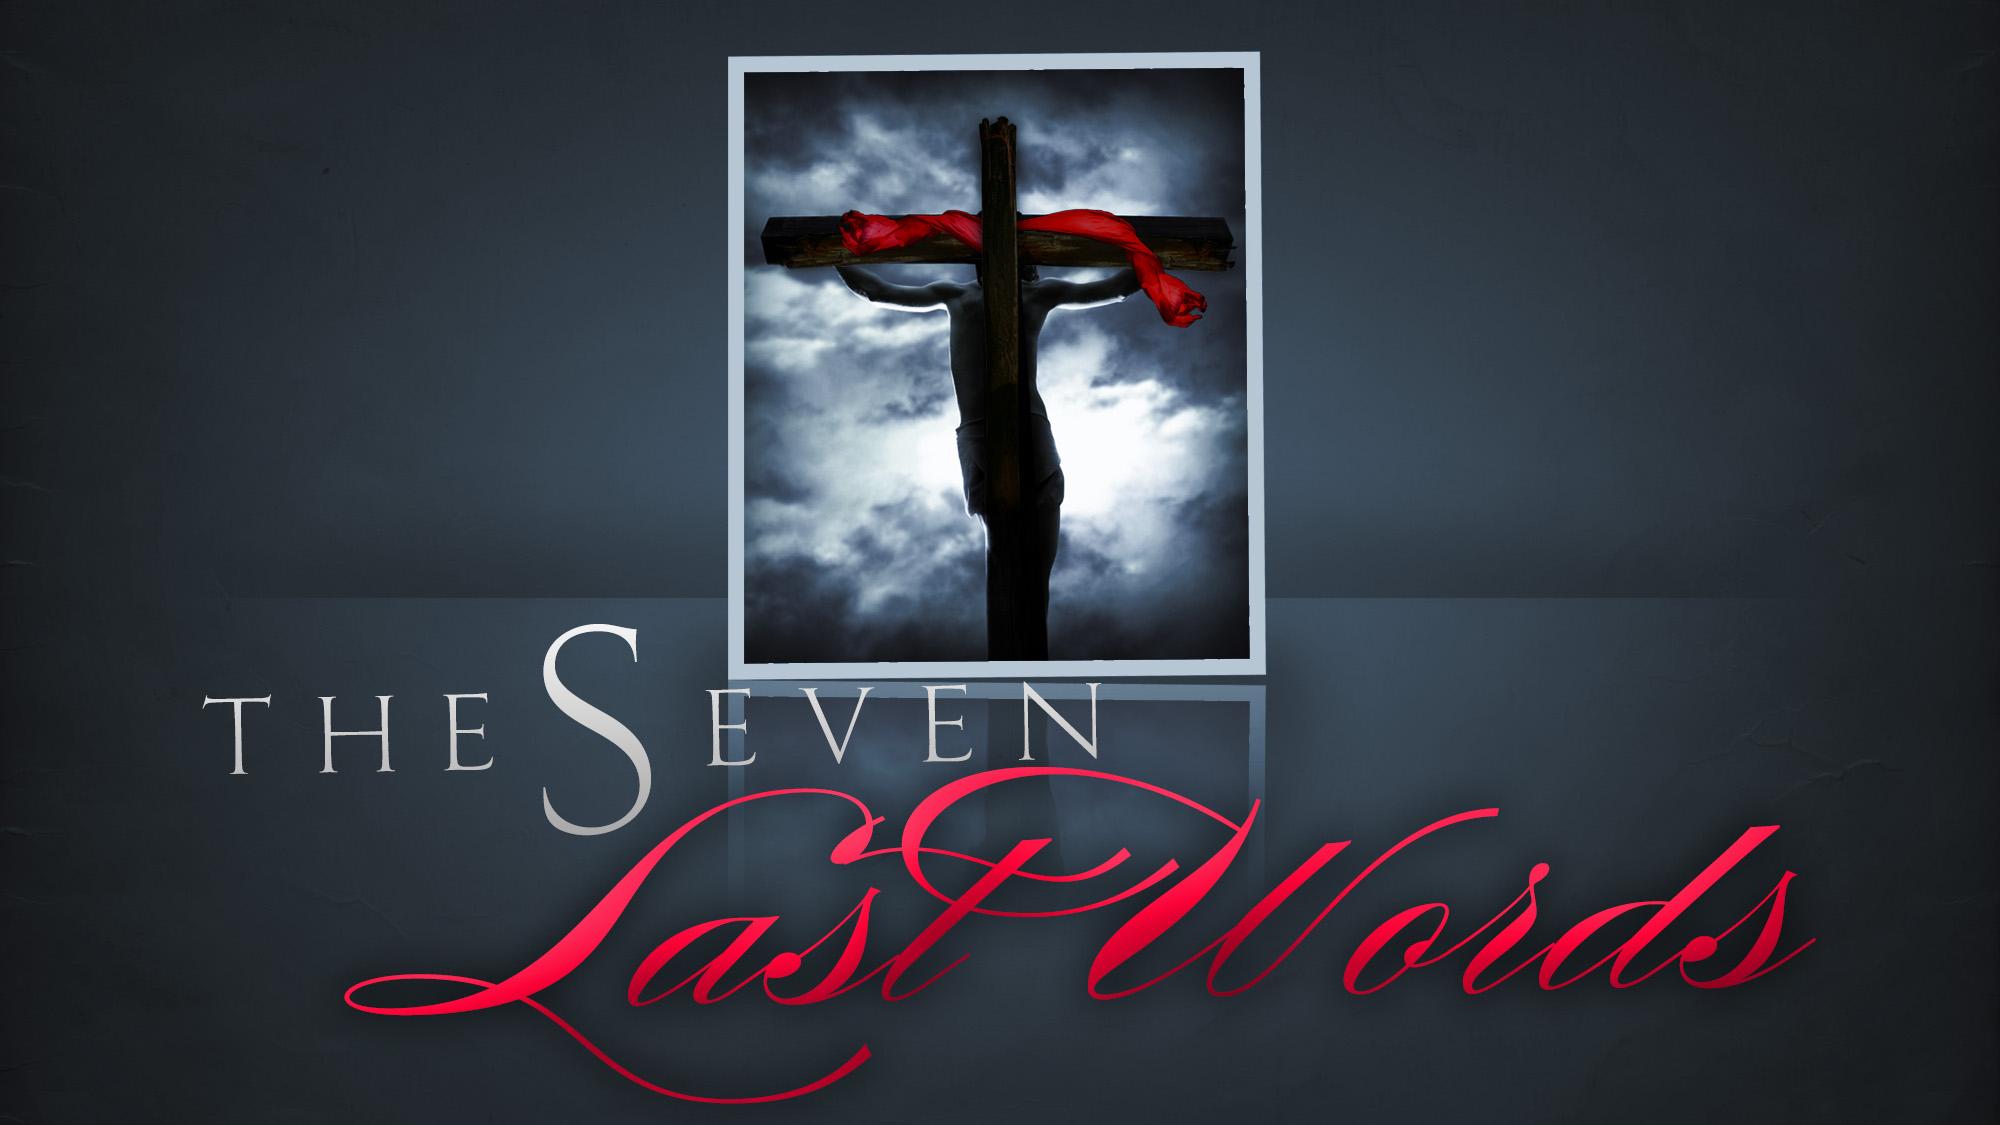 The Seven Last Words Part 1